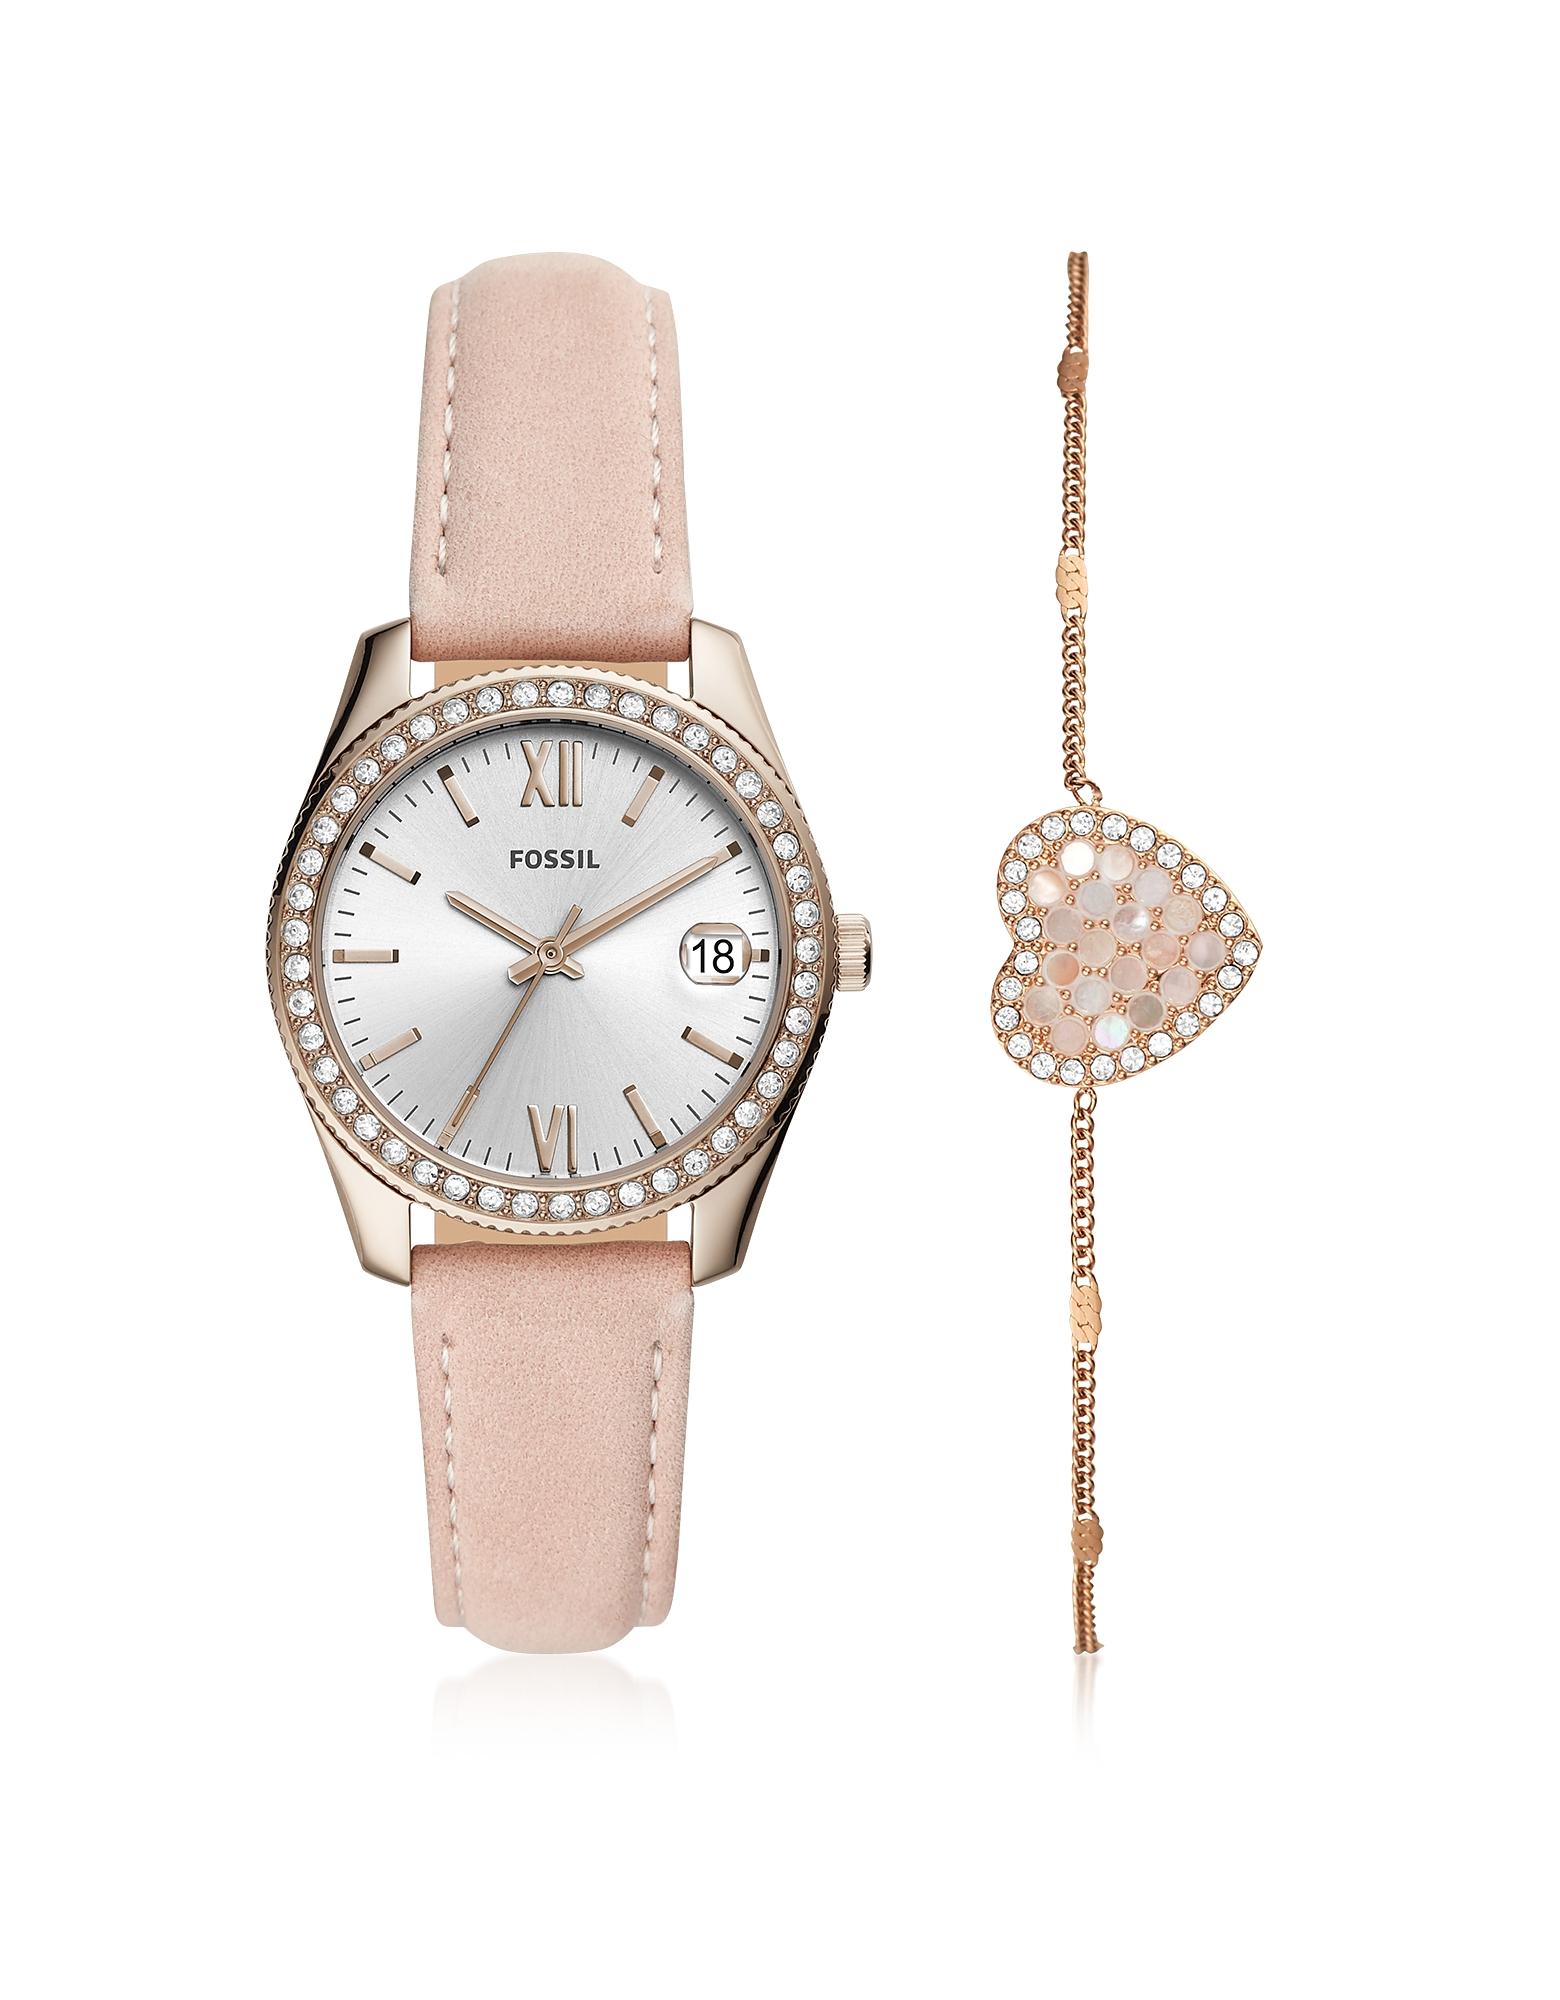 Scarlette Mini Three-Hand Date Blush Leather Watch Set